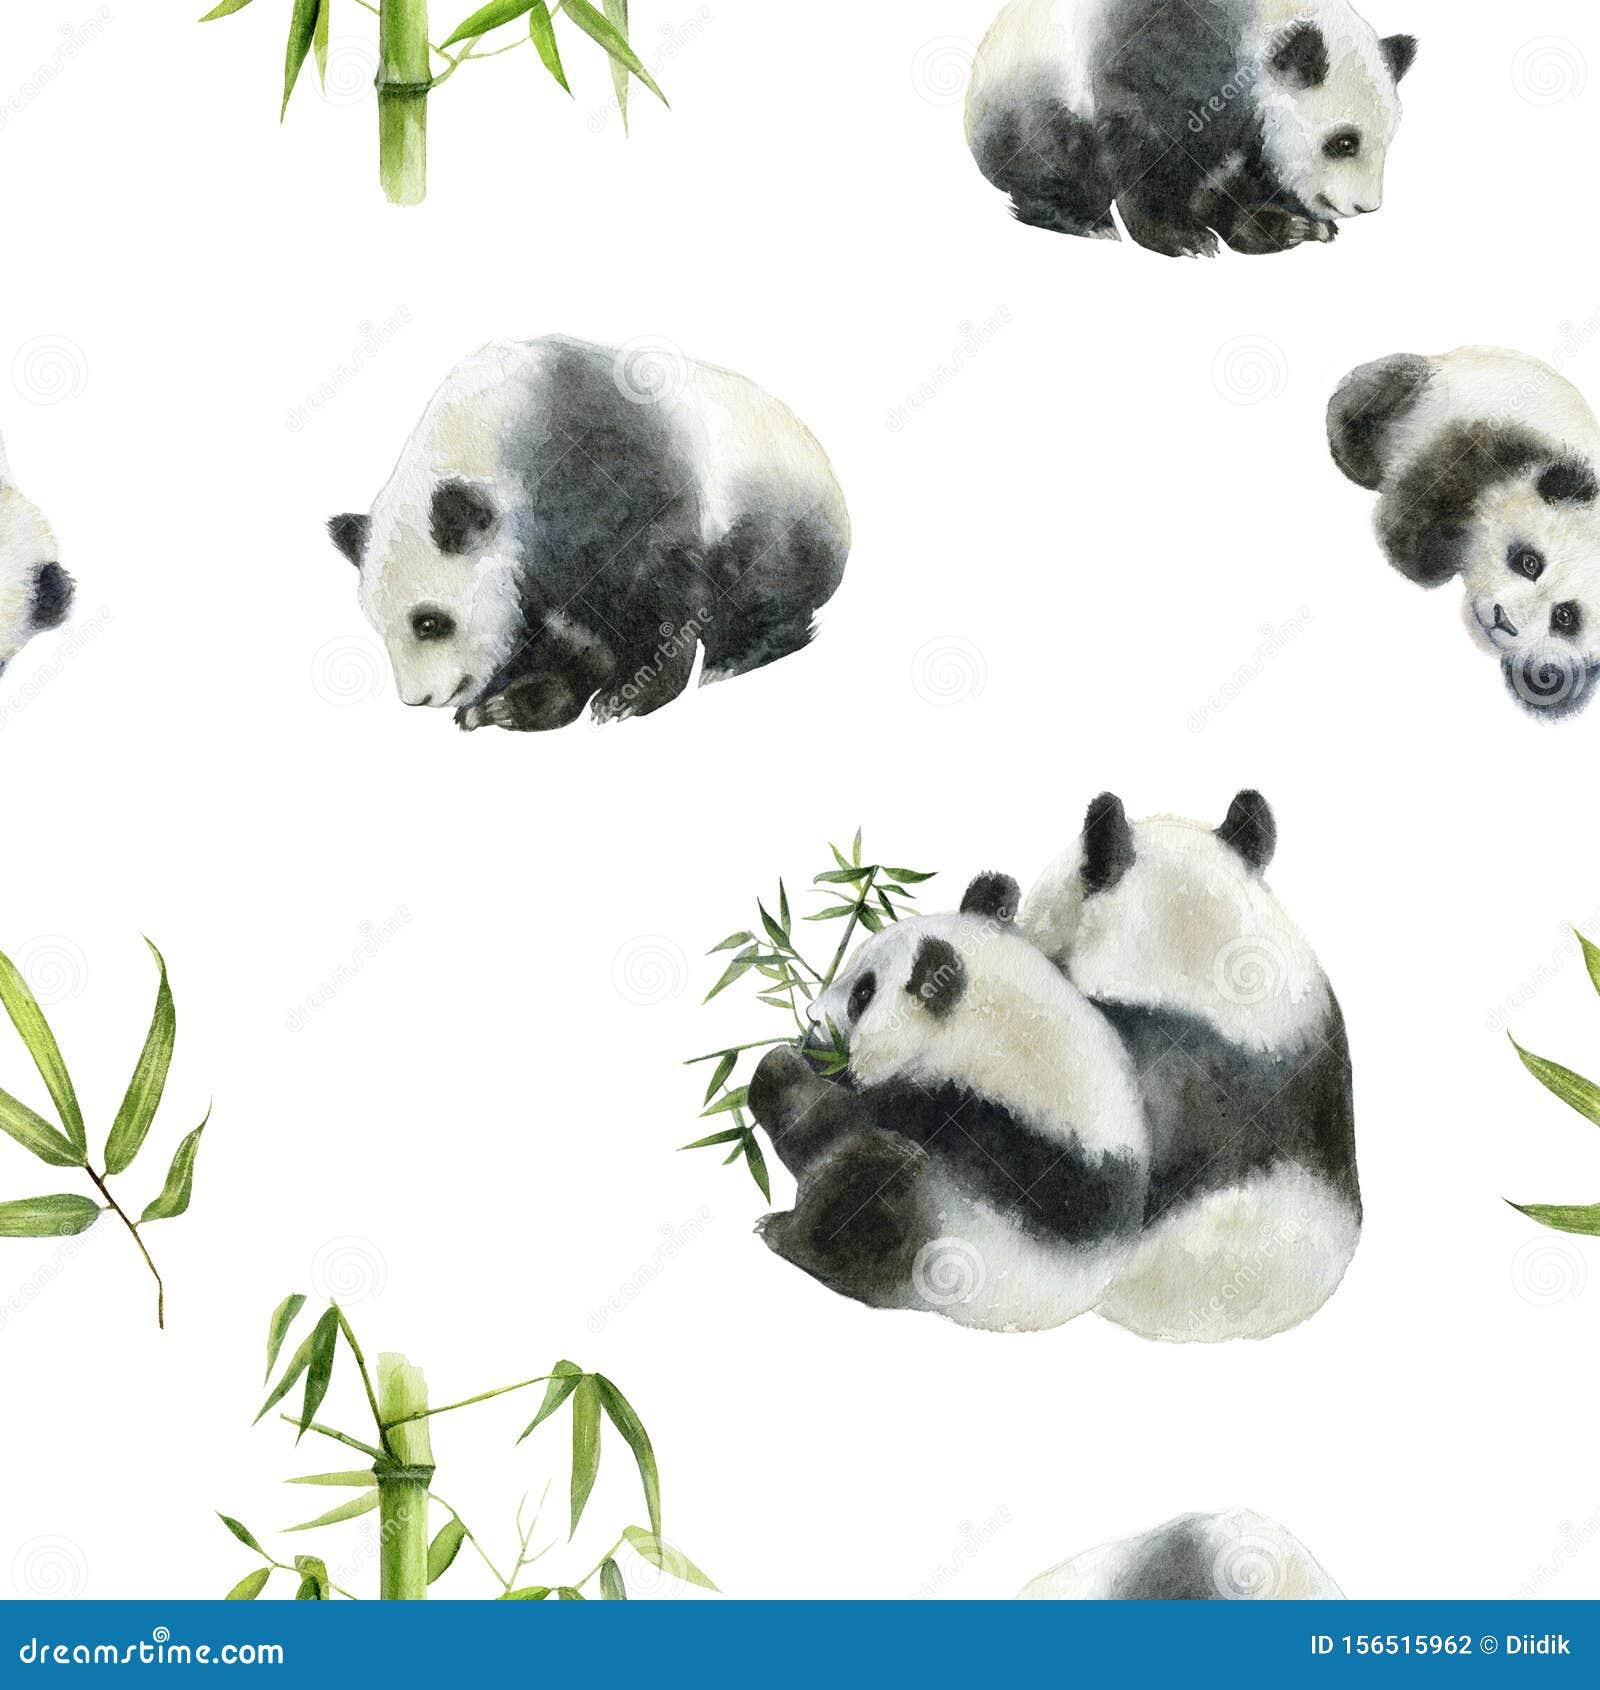 Panda bear drawn watercolor illustration. Seamless pattern.